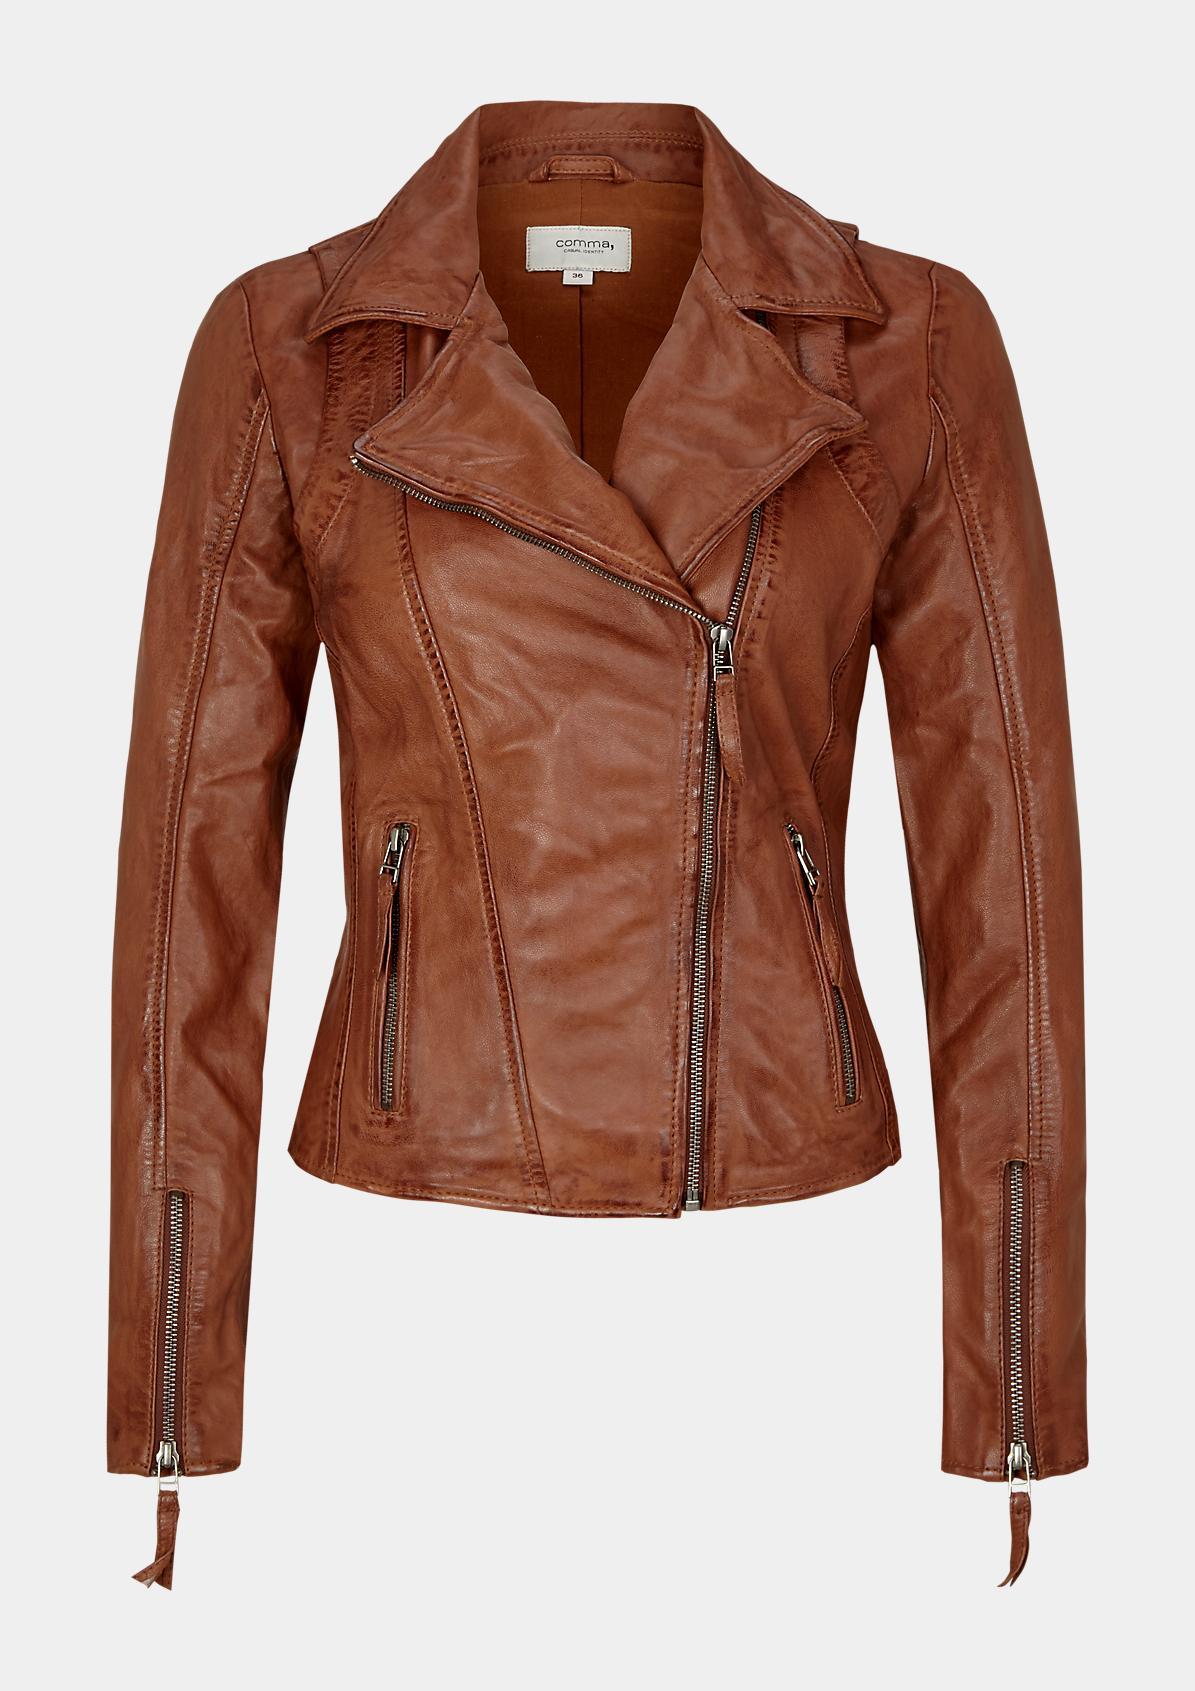 88.908.51.2148 Lederjacke | Fashion & Mode | comma Online Store